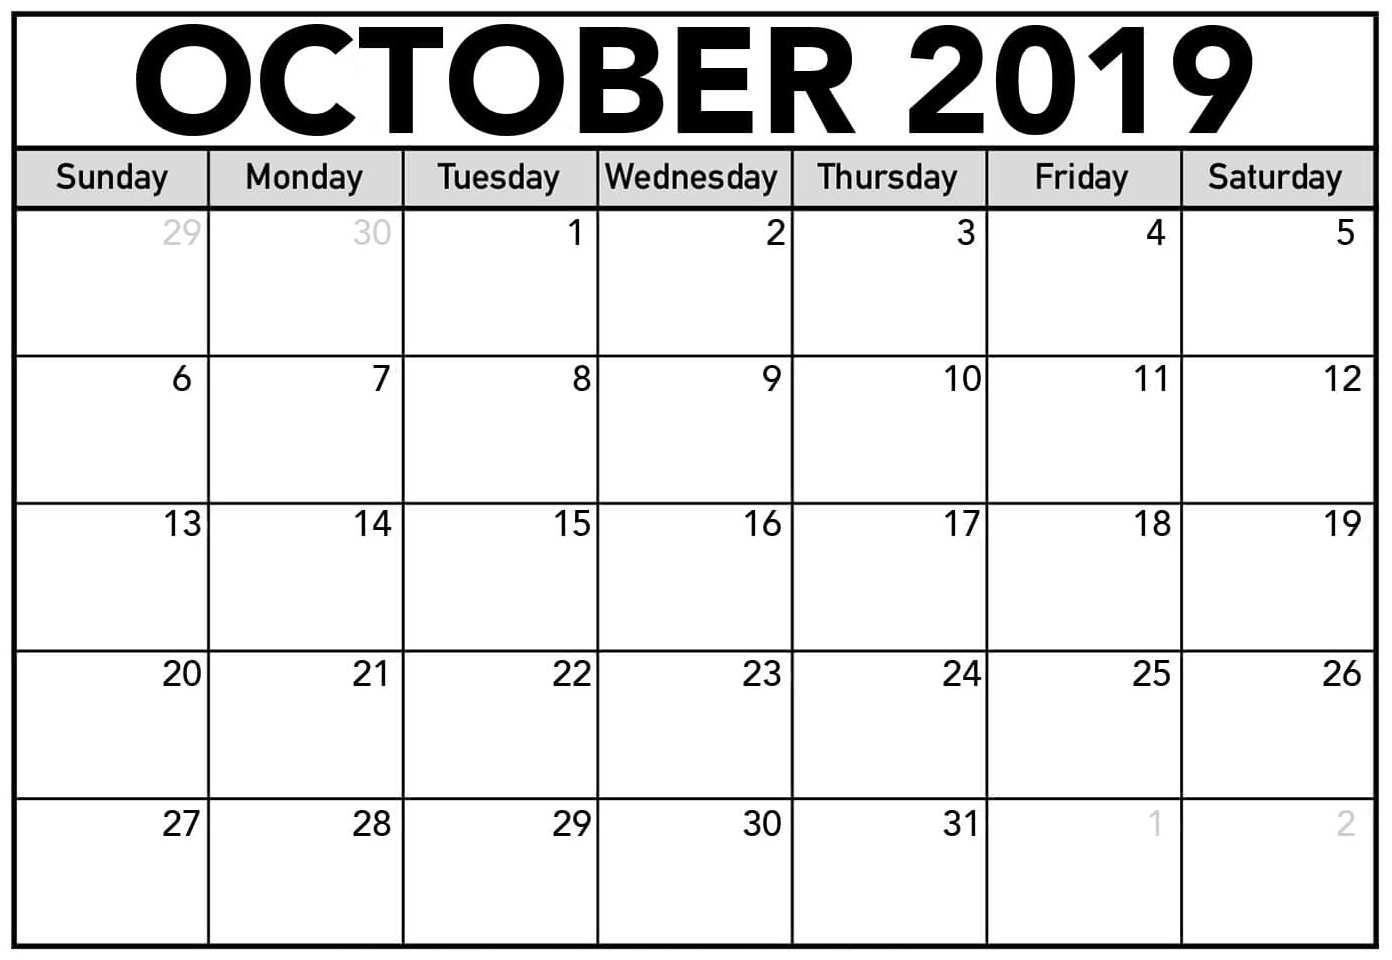 Free Blank Calendar October 2019 Printable - 2019 Calendars